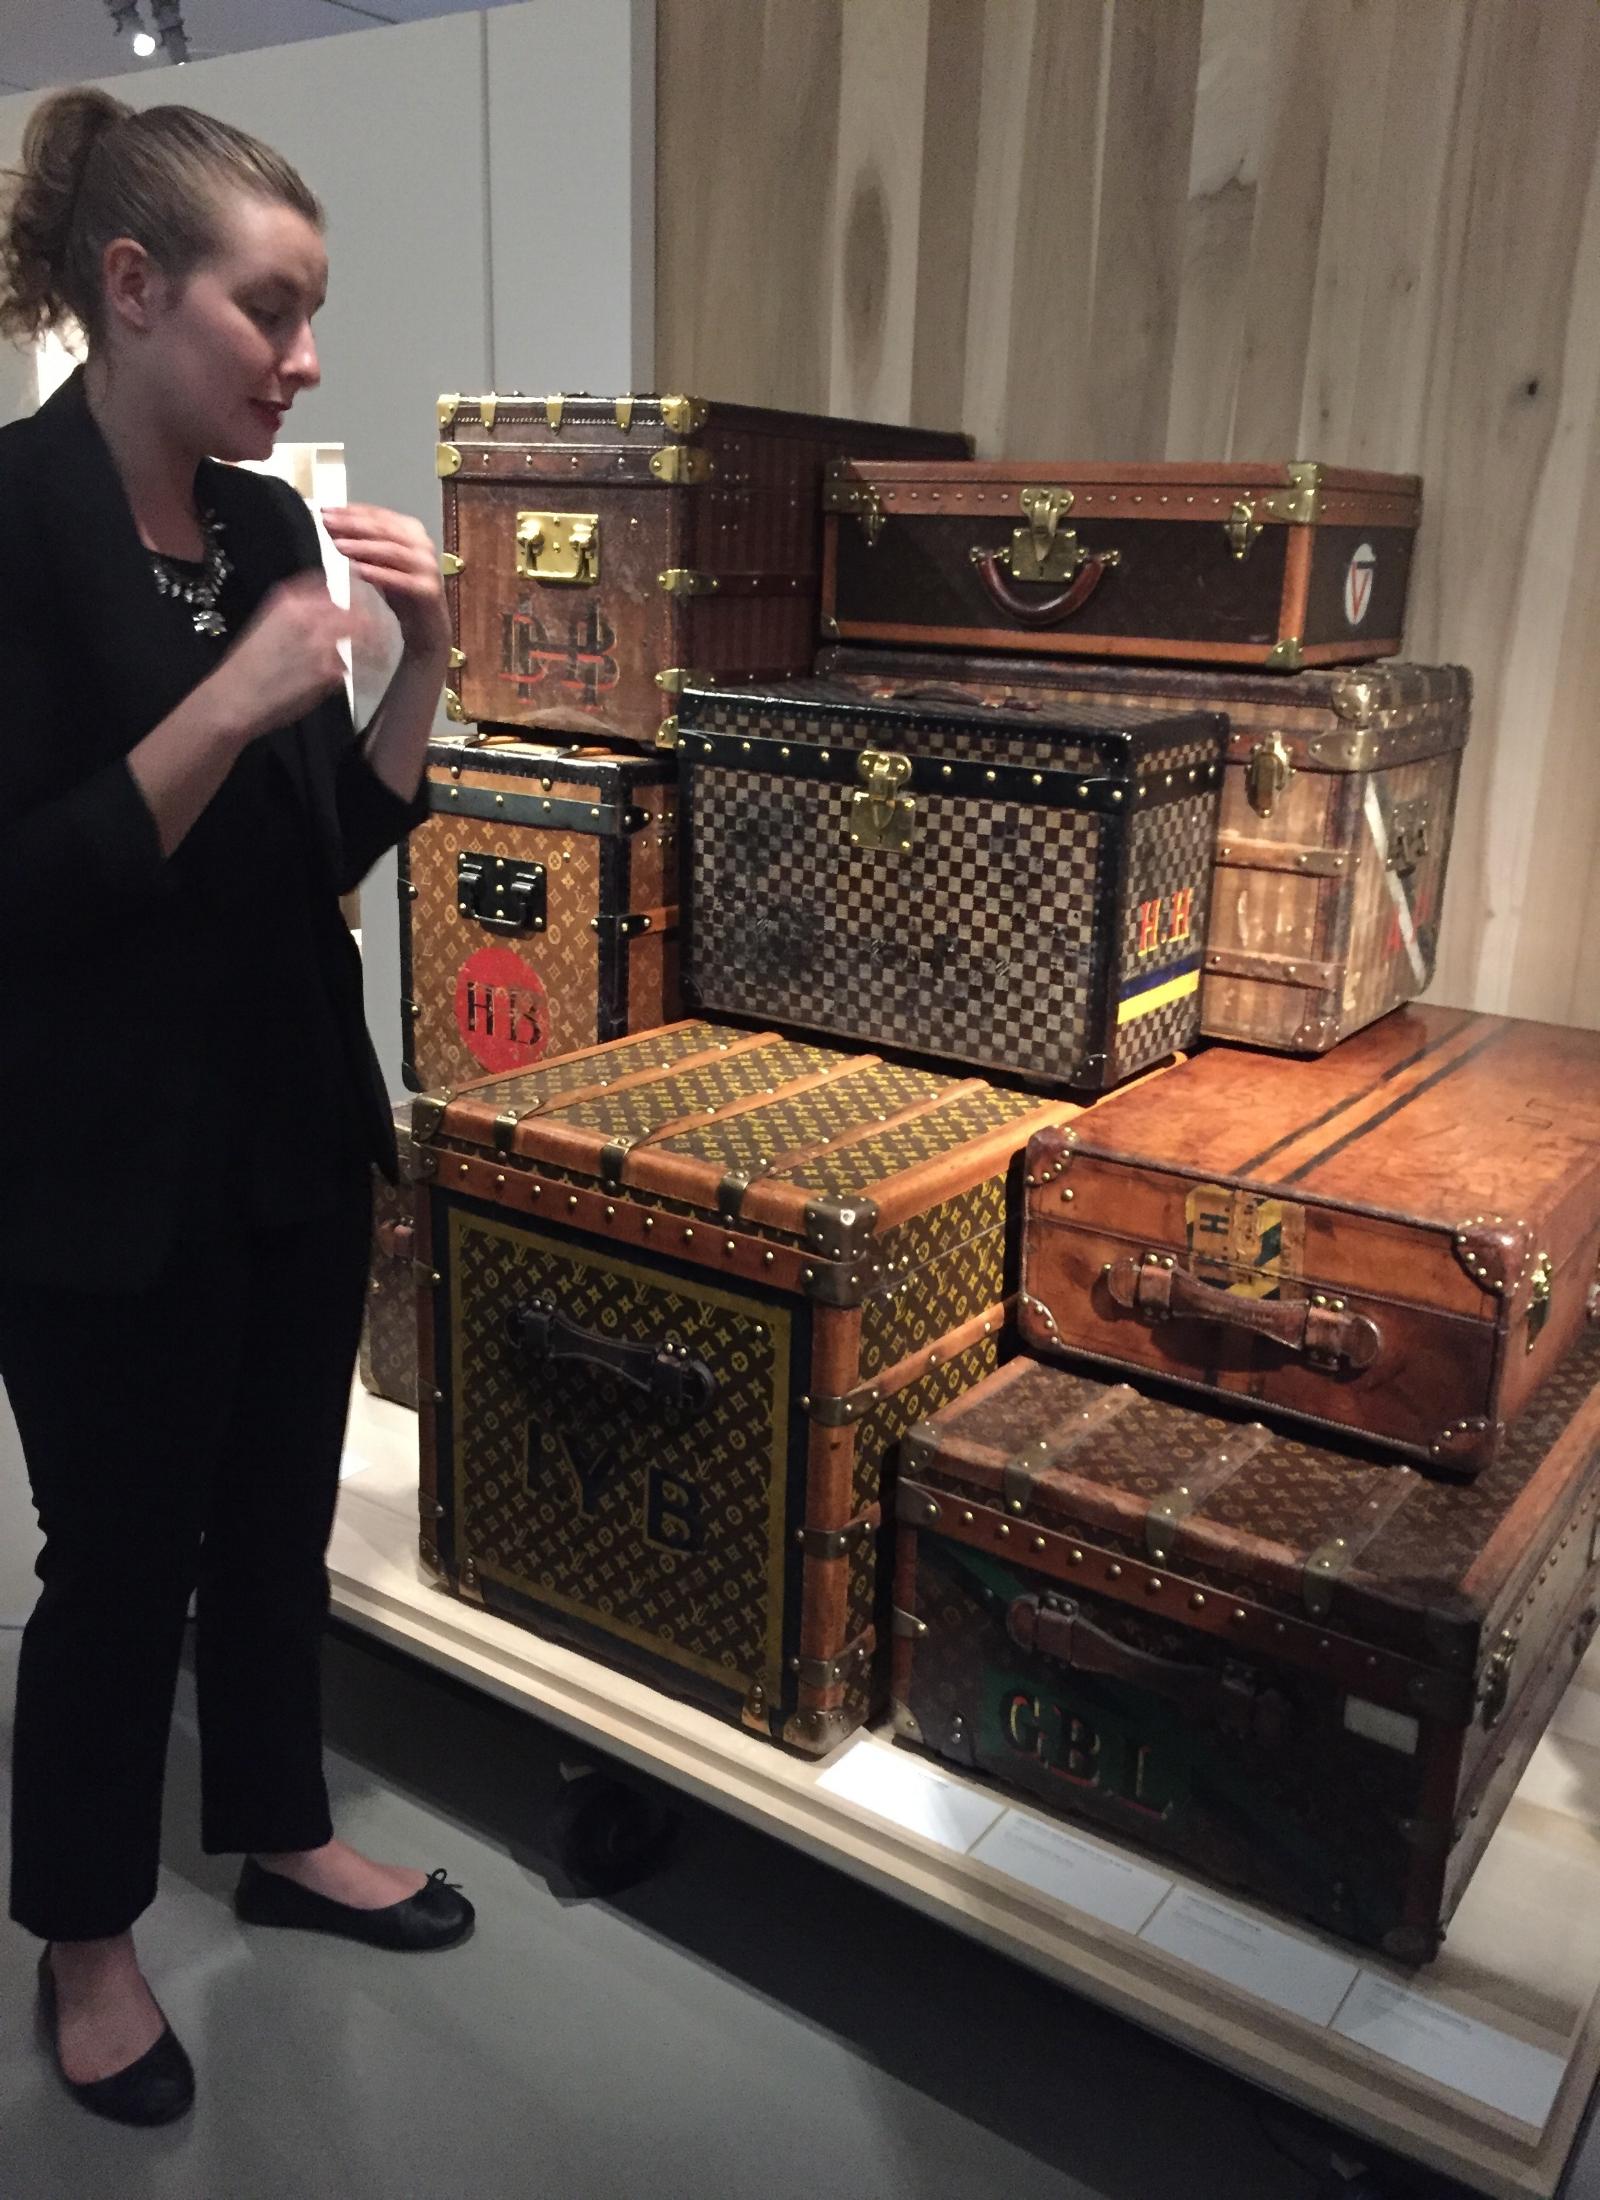 Glamorous Living - Five Days in Paris - Doreen Chambers Top Interior Designer - Brooklyn - New work - South Florida